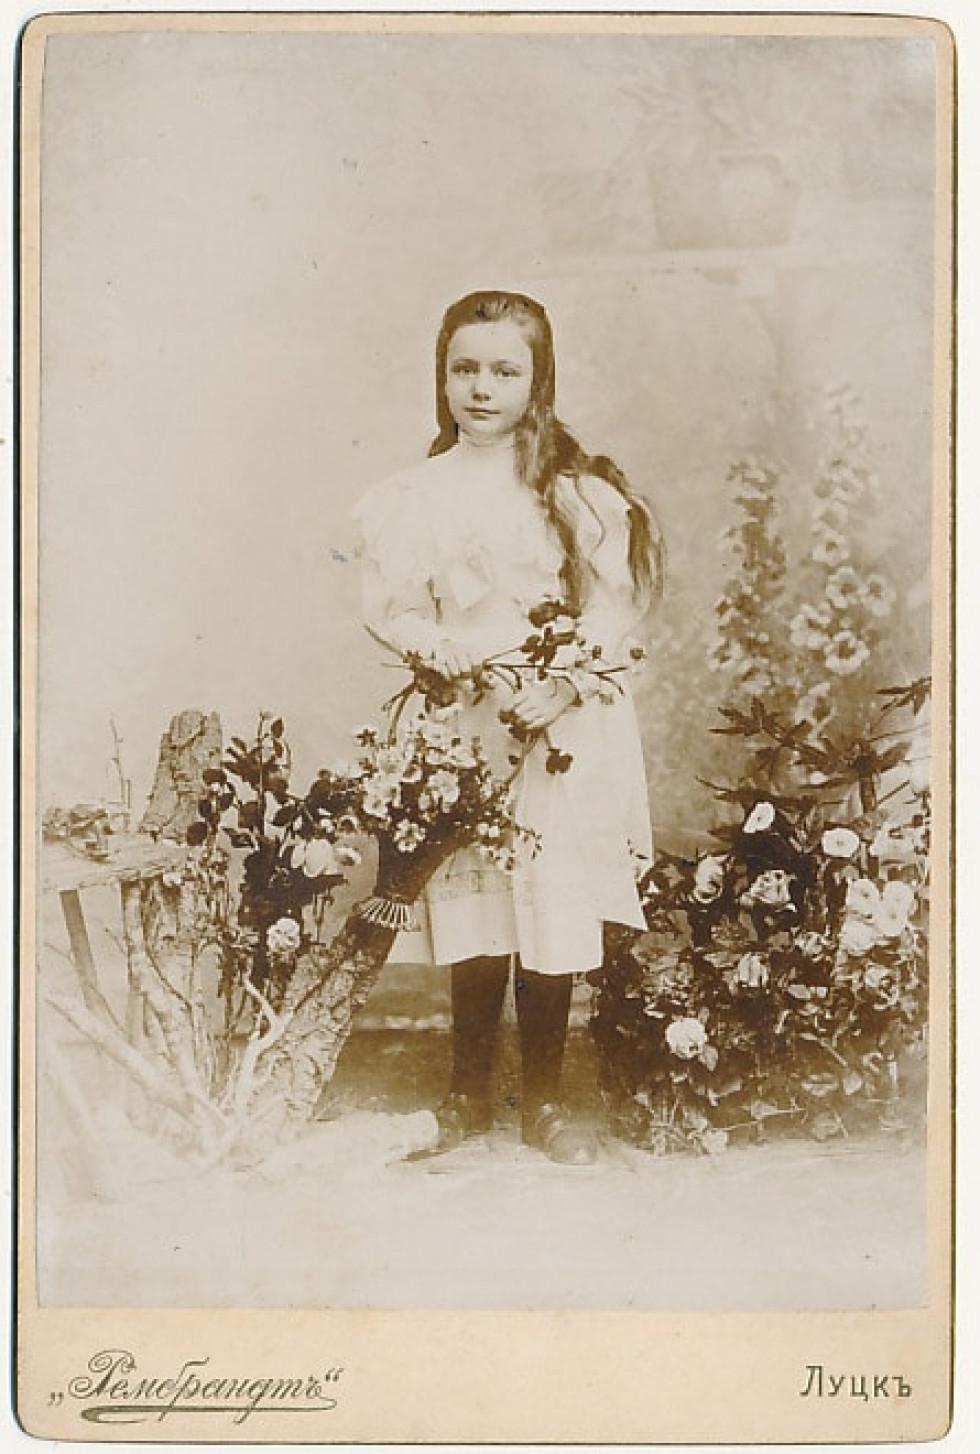 Луцьк, фотосалон «Рембрандт» поч. ХХ ст.